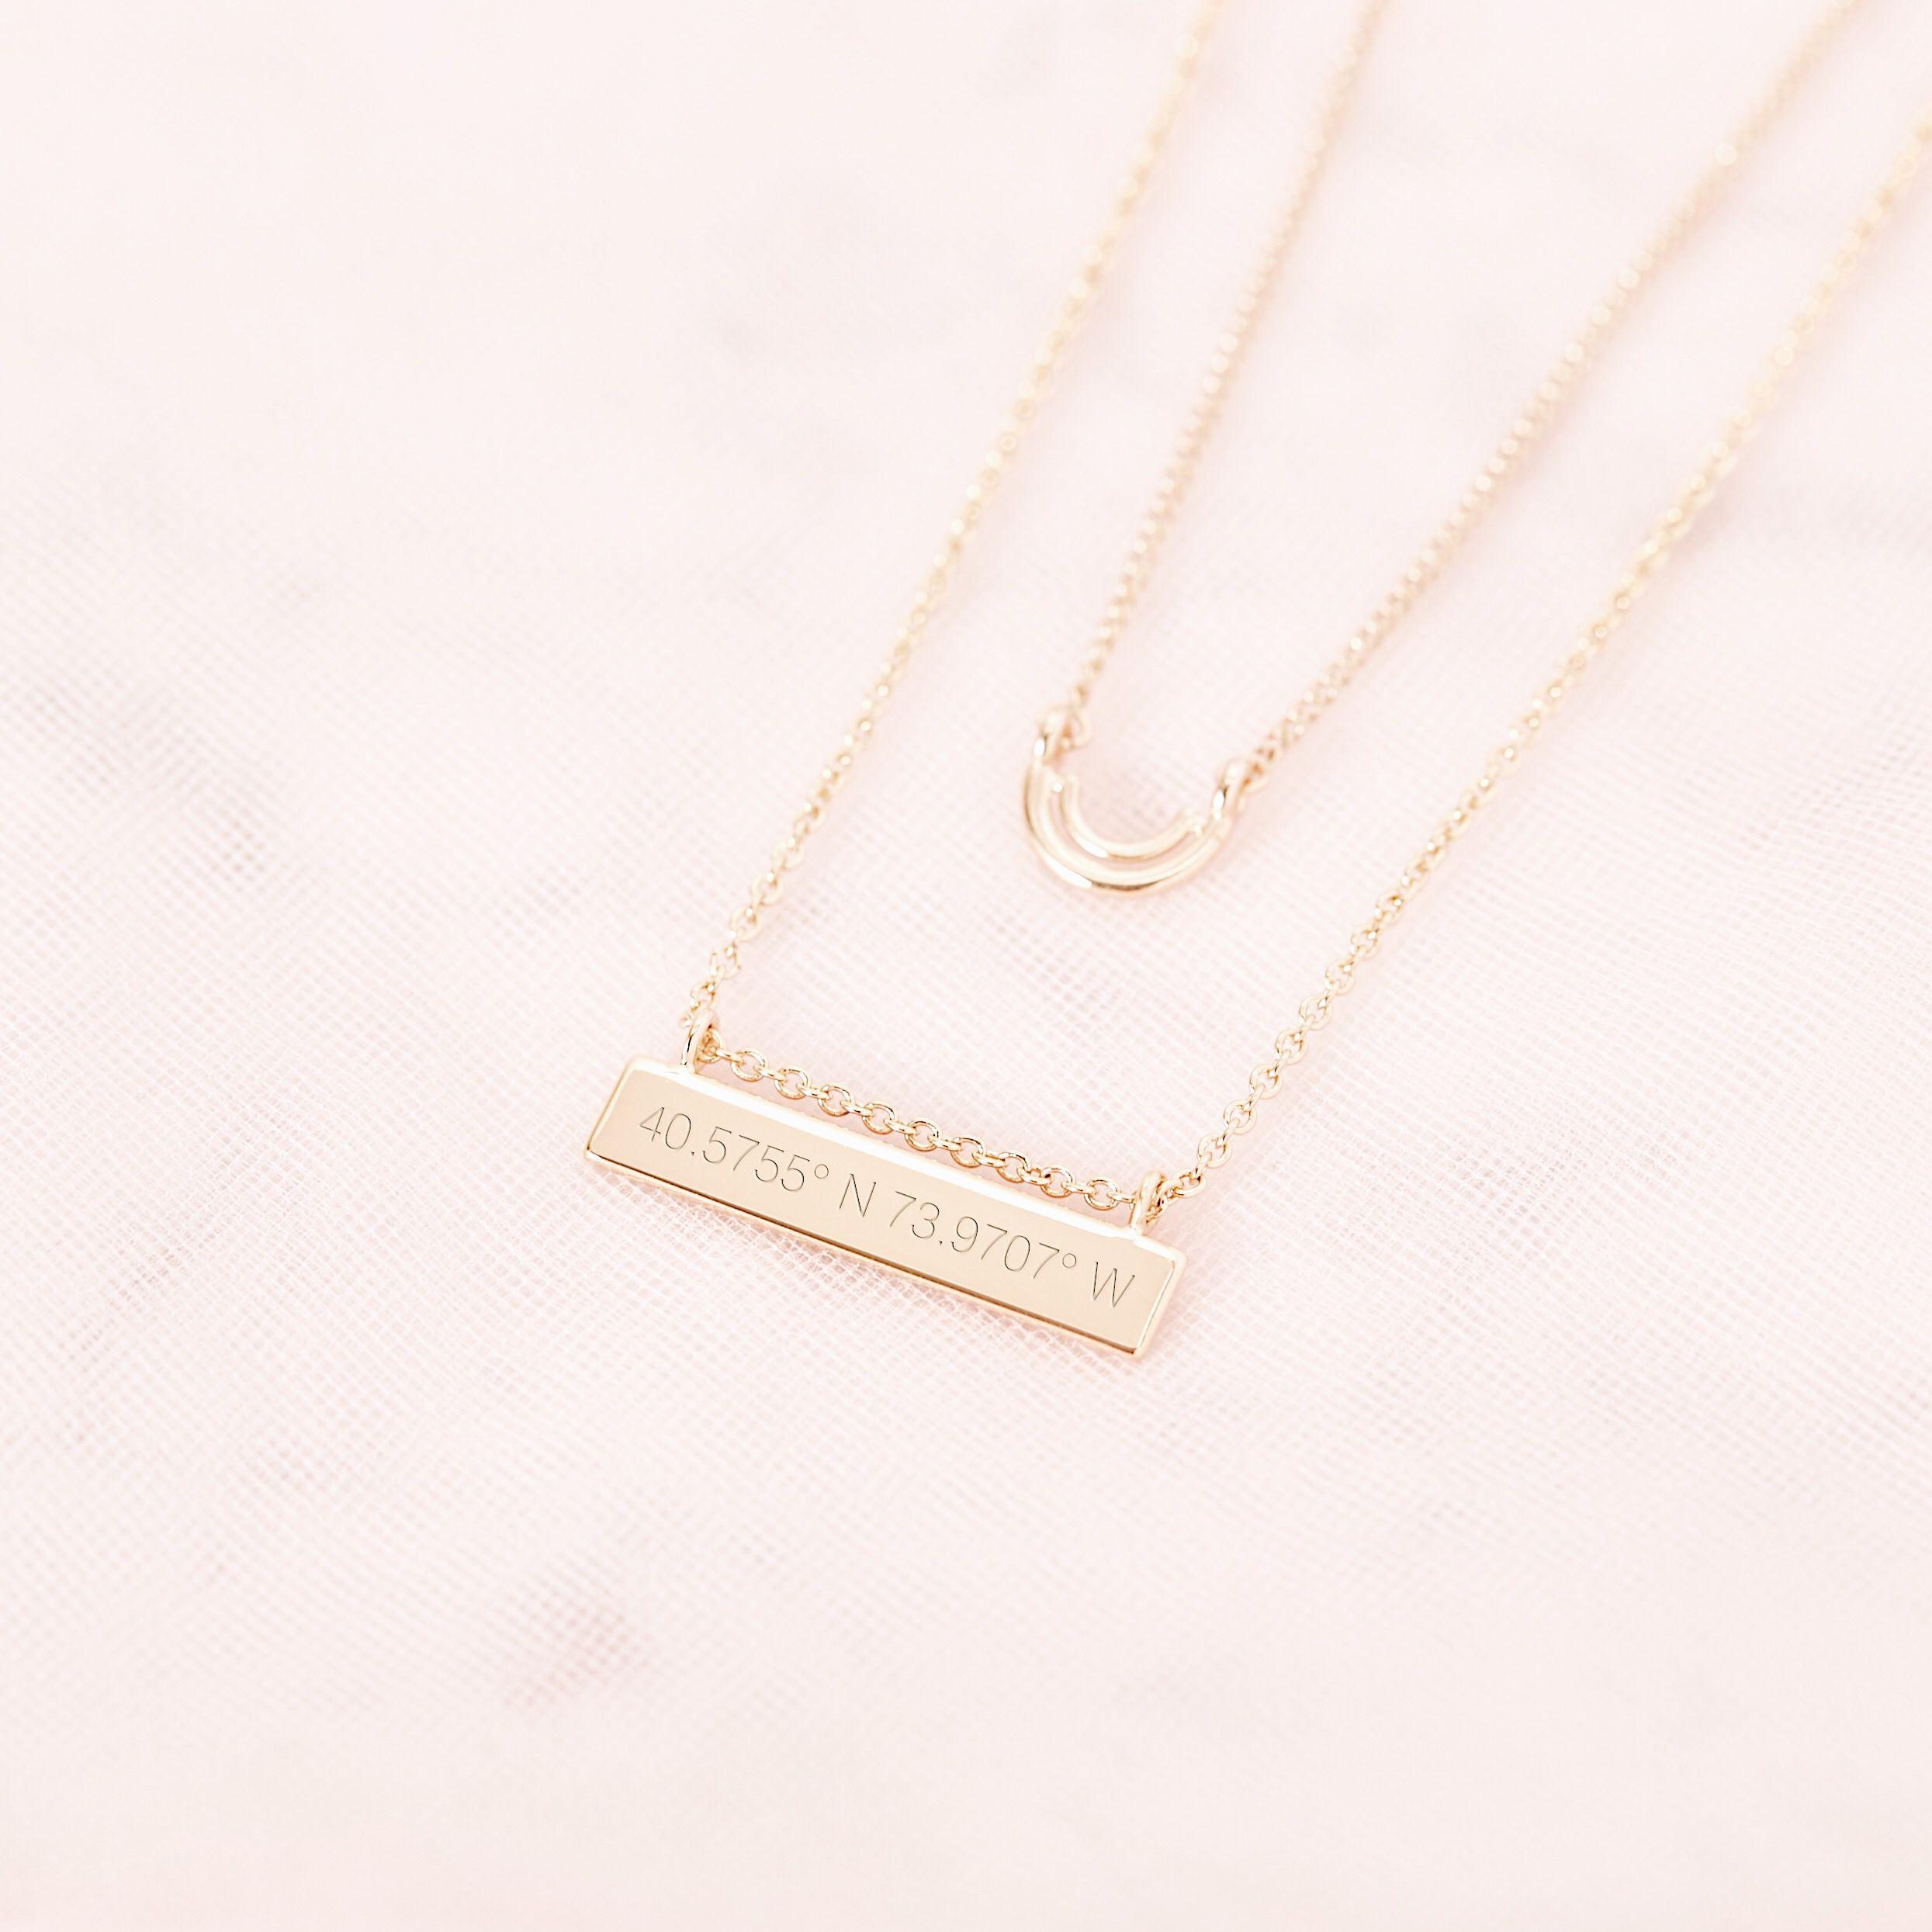 Brook /& York Petite Date Bar Necklace